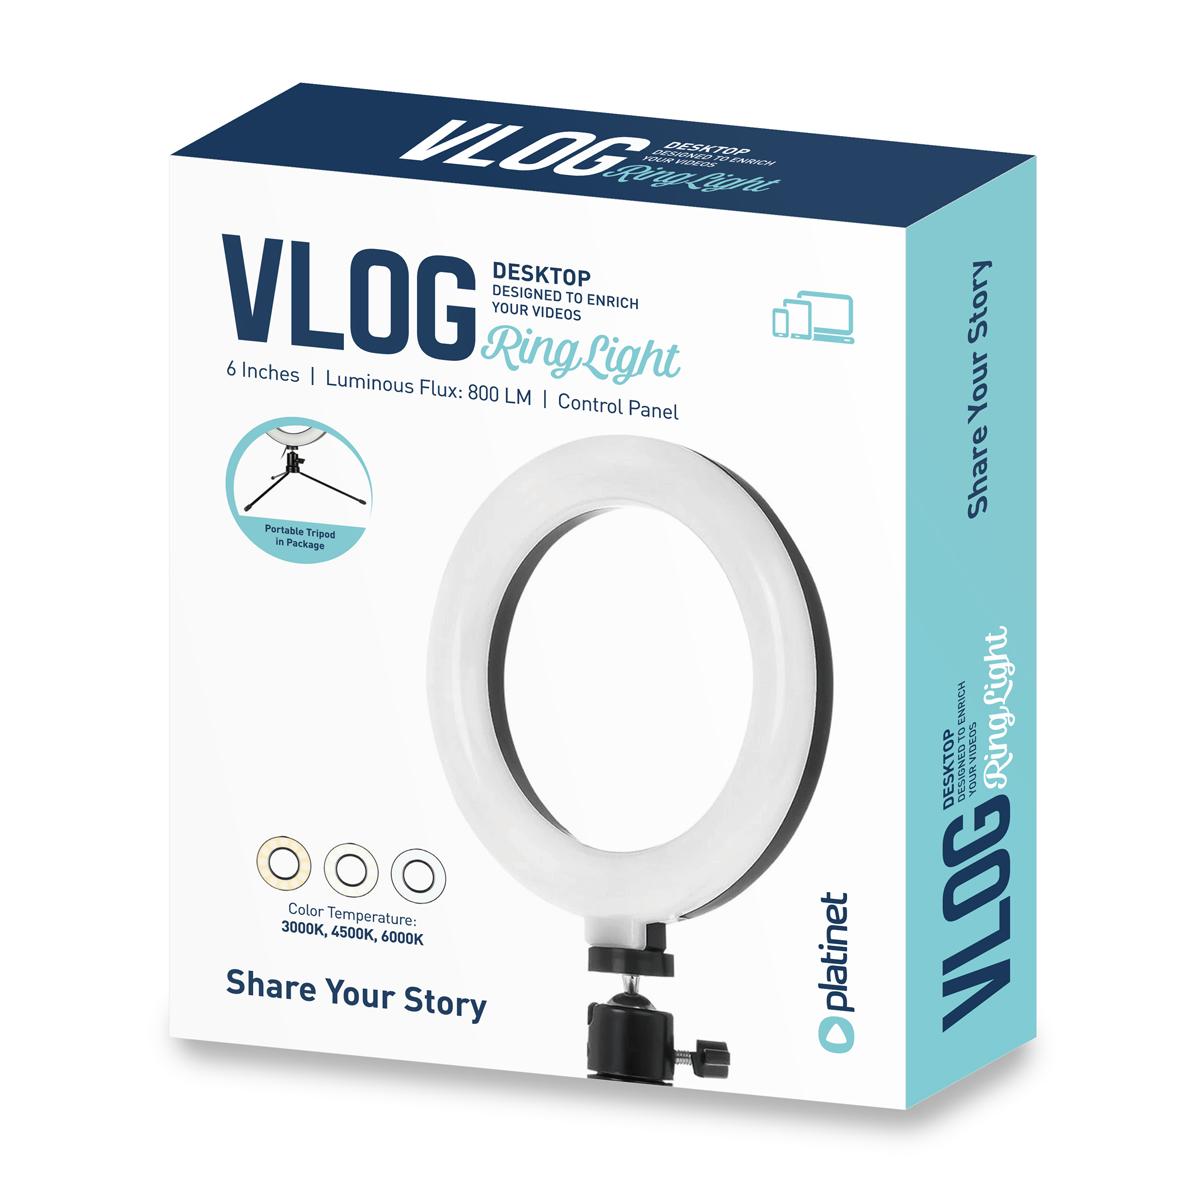 Platinet 6 inch Vlog LED ringlamp (48 LEDs) op driepoot (14,5cm) - 3000K-4500K-6000K instelbaar, 1,9m USB kabel met schakelaar inbegrepen